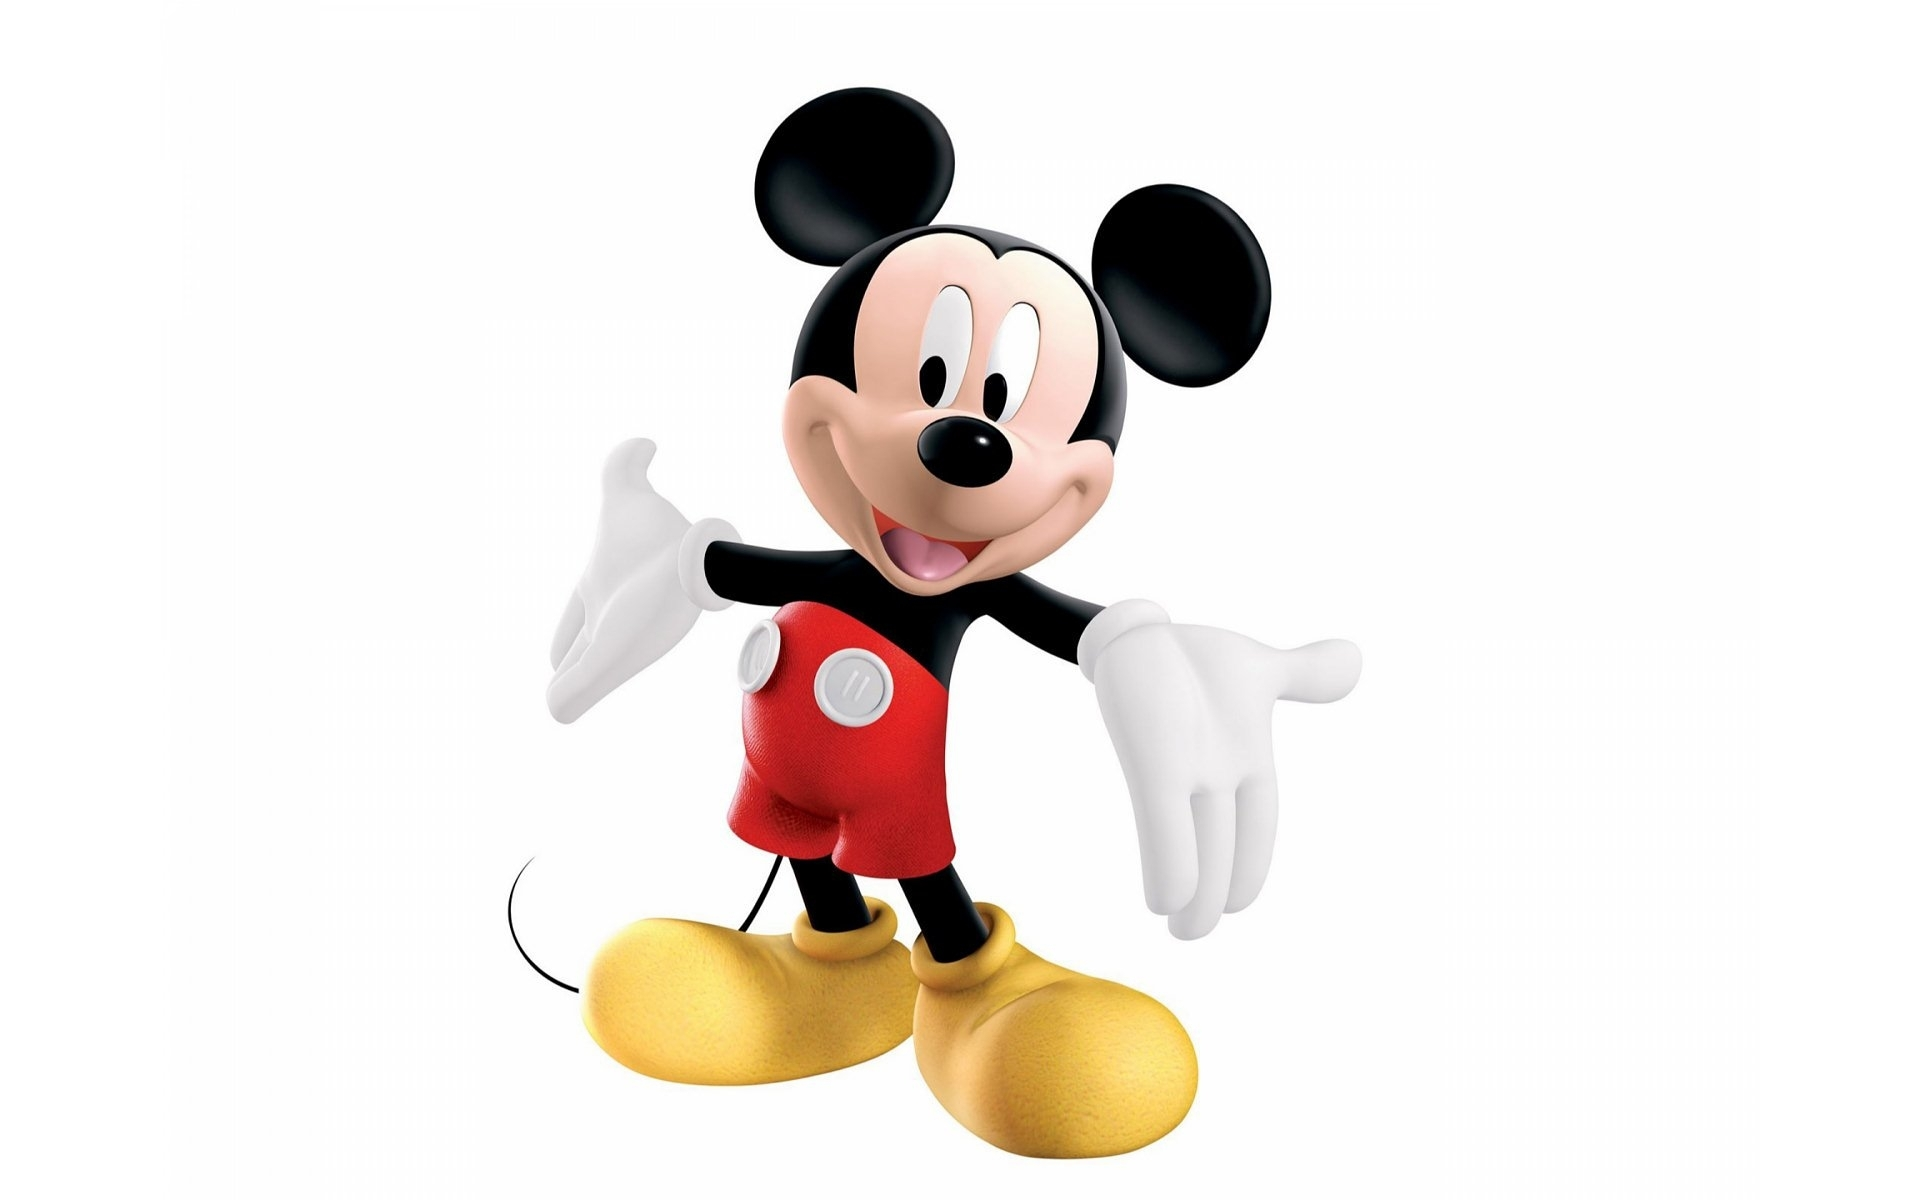 mickey mouse full hd fond d'écran and arrière-plan | 1920x1200 | id